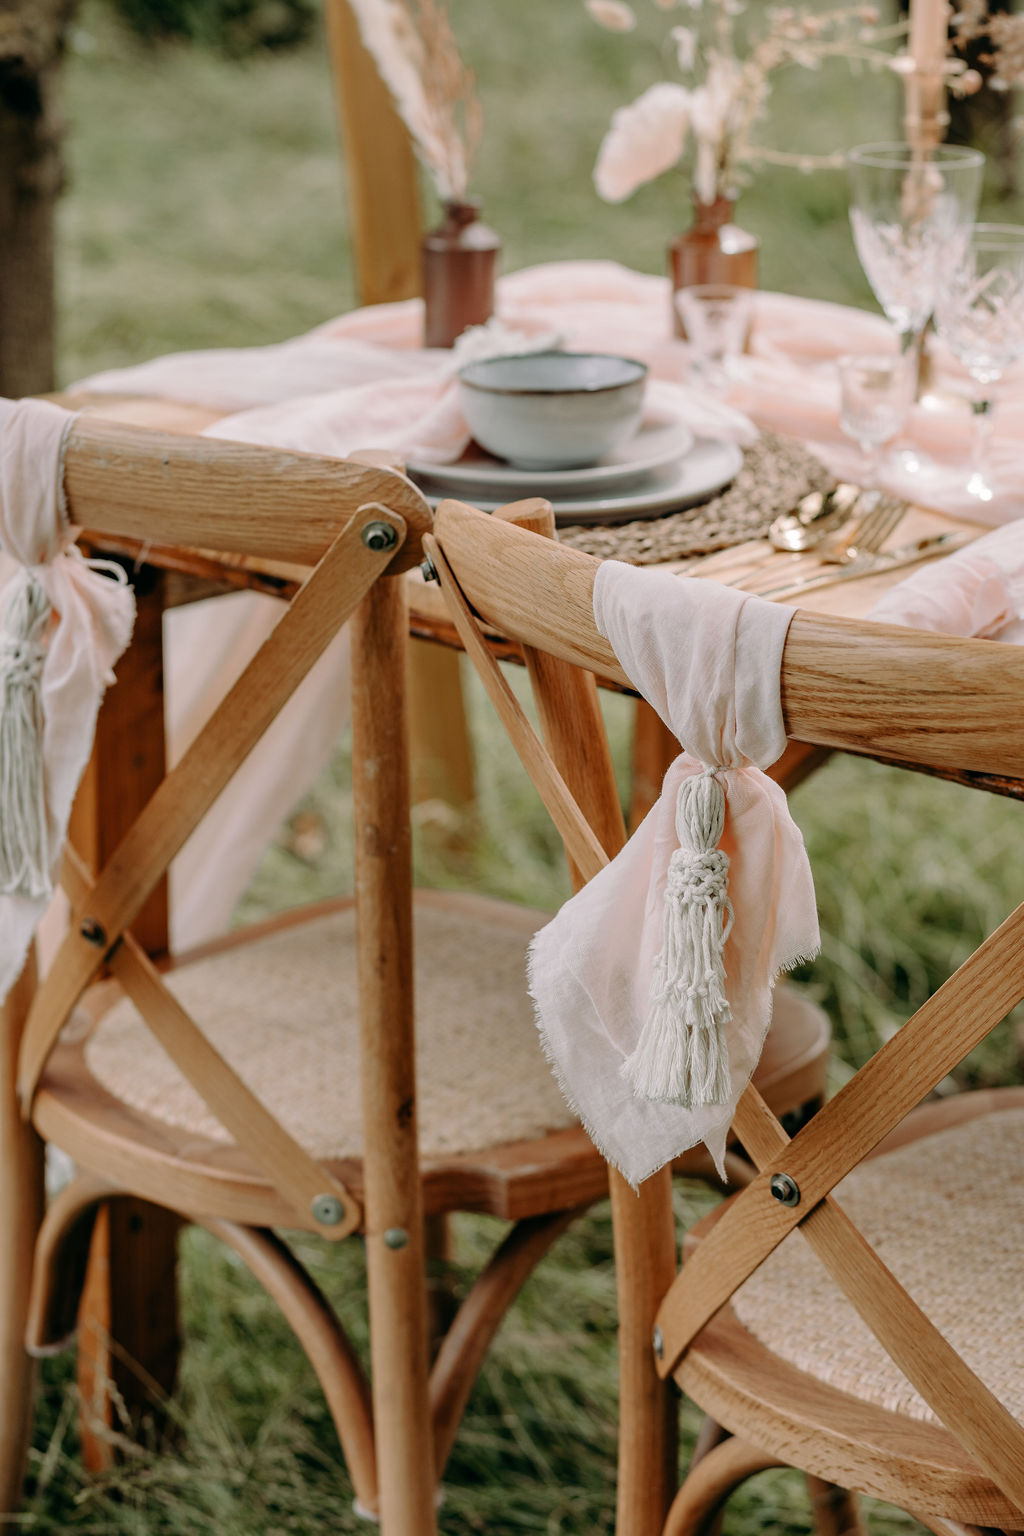 sustainable boho wedding - macrame chair decoration - bohemian wedding styling - rustic wedding table - unconventional wedding